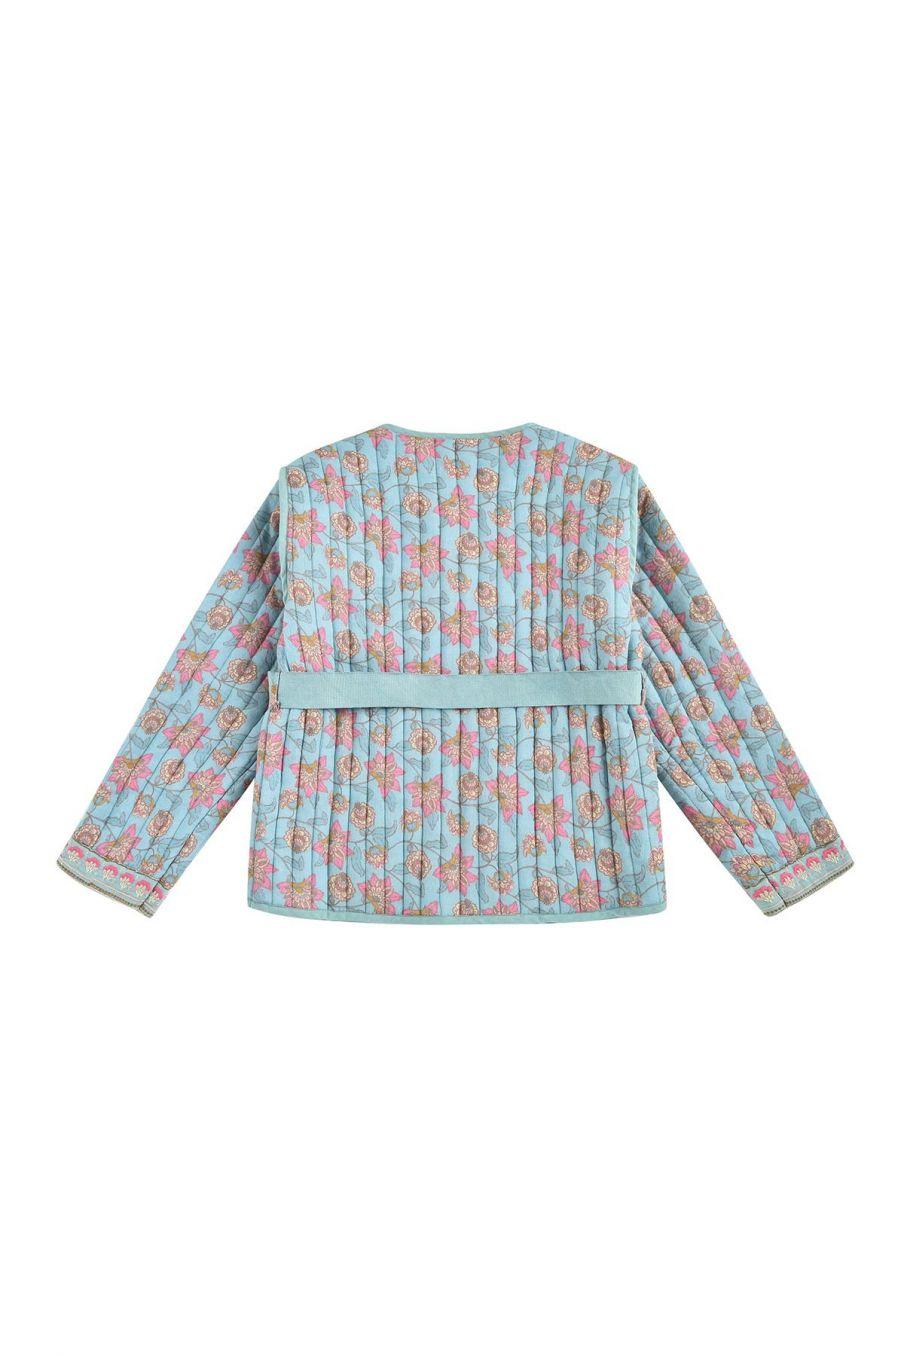 boheme chic vintage veste fille teliani turquoise flowers